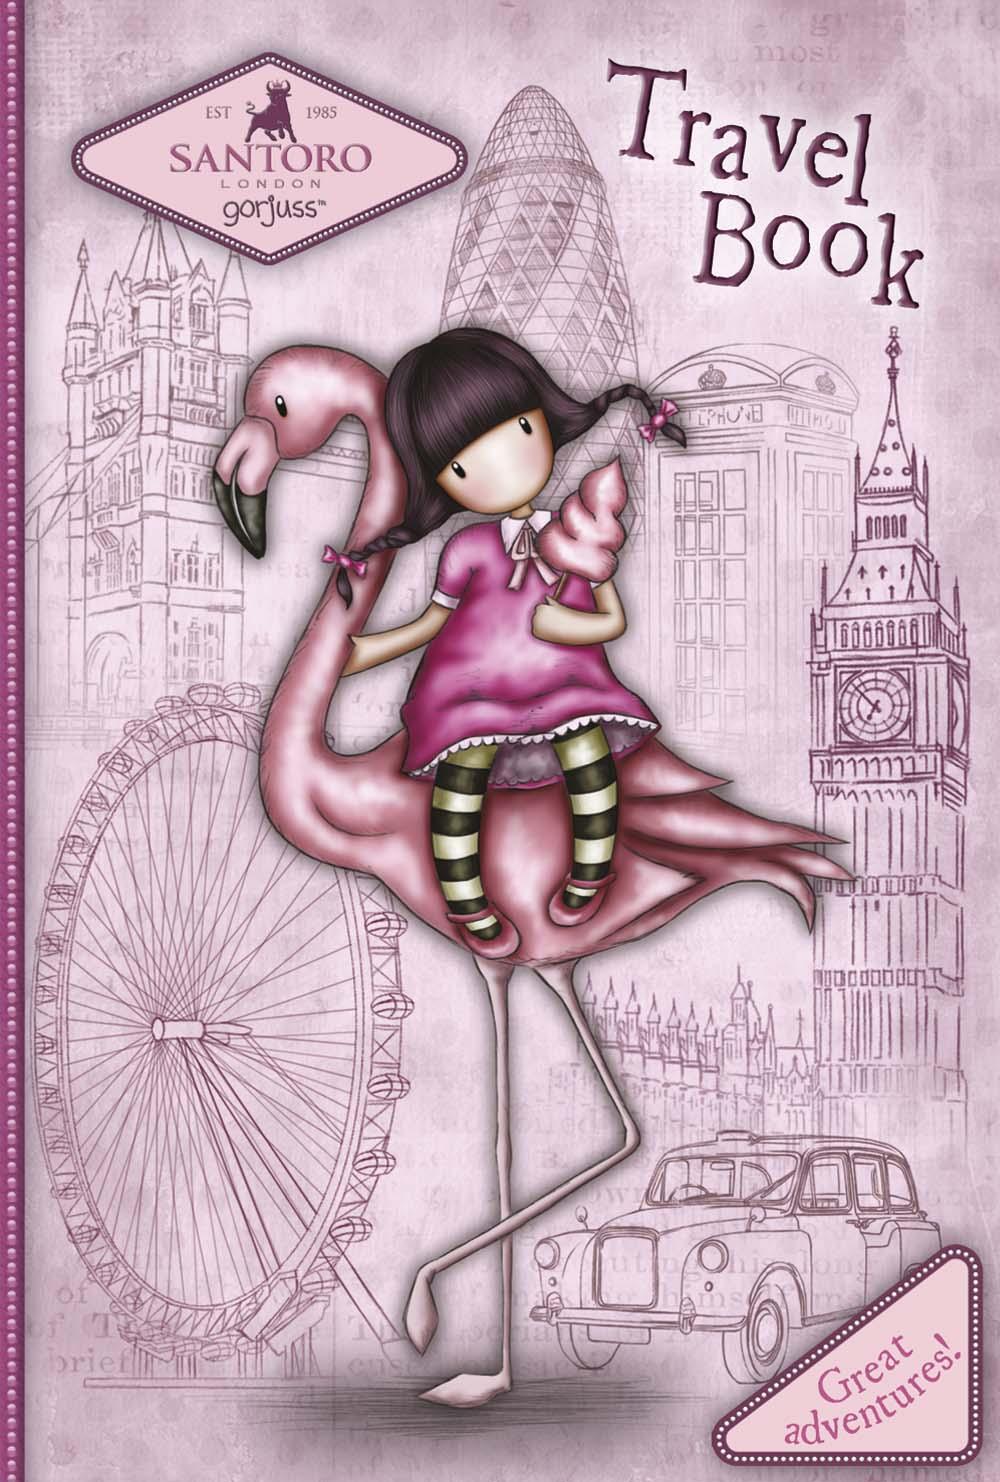 Travel Book - Great Adventures!